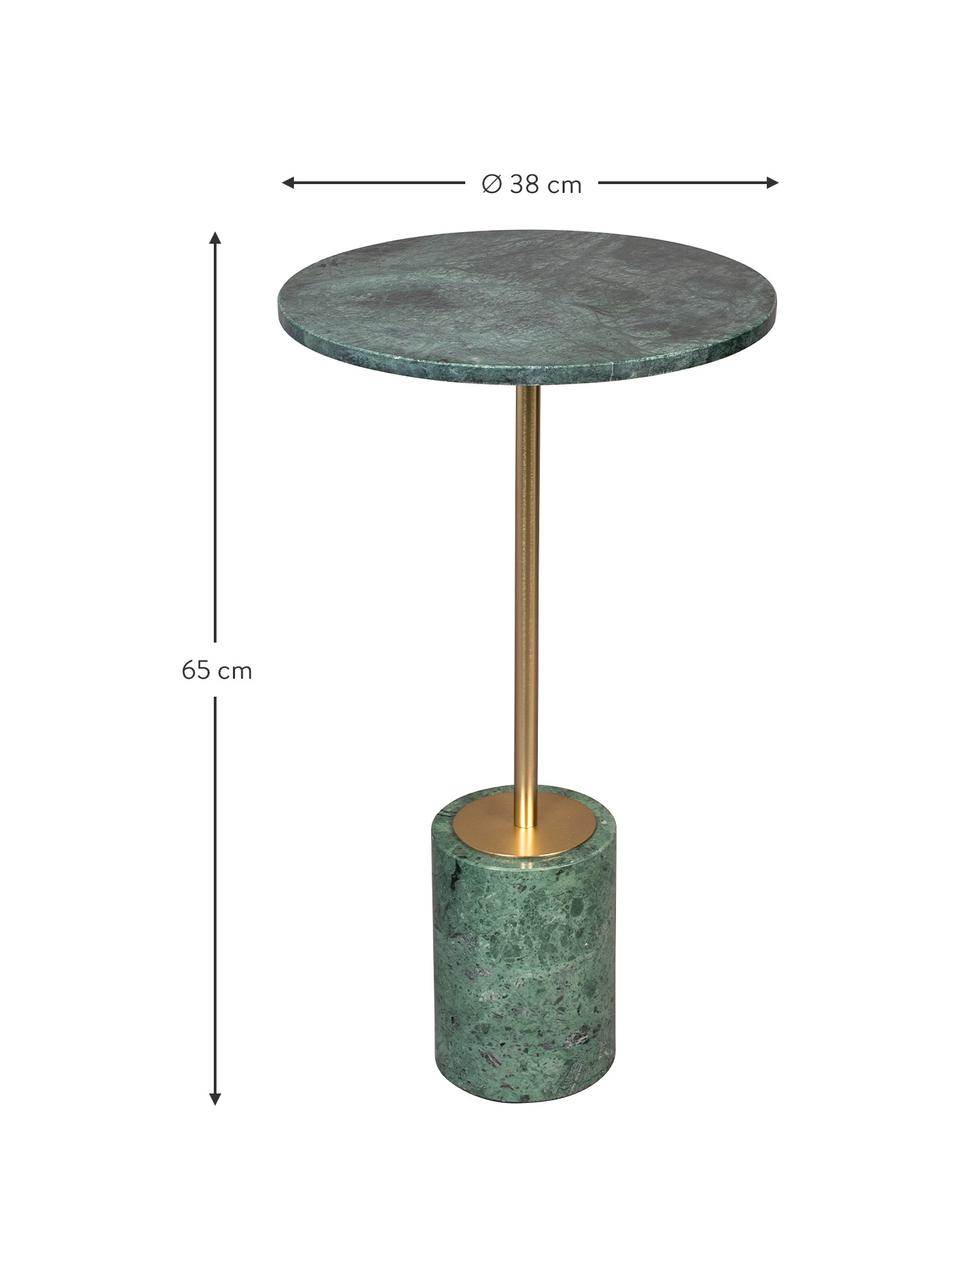 Table d'appoint ronde en marbre Gunnar, Vert, marbré